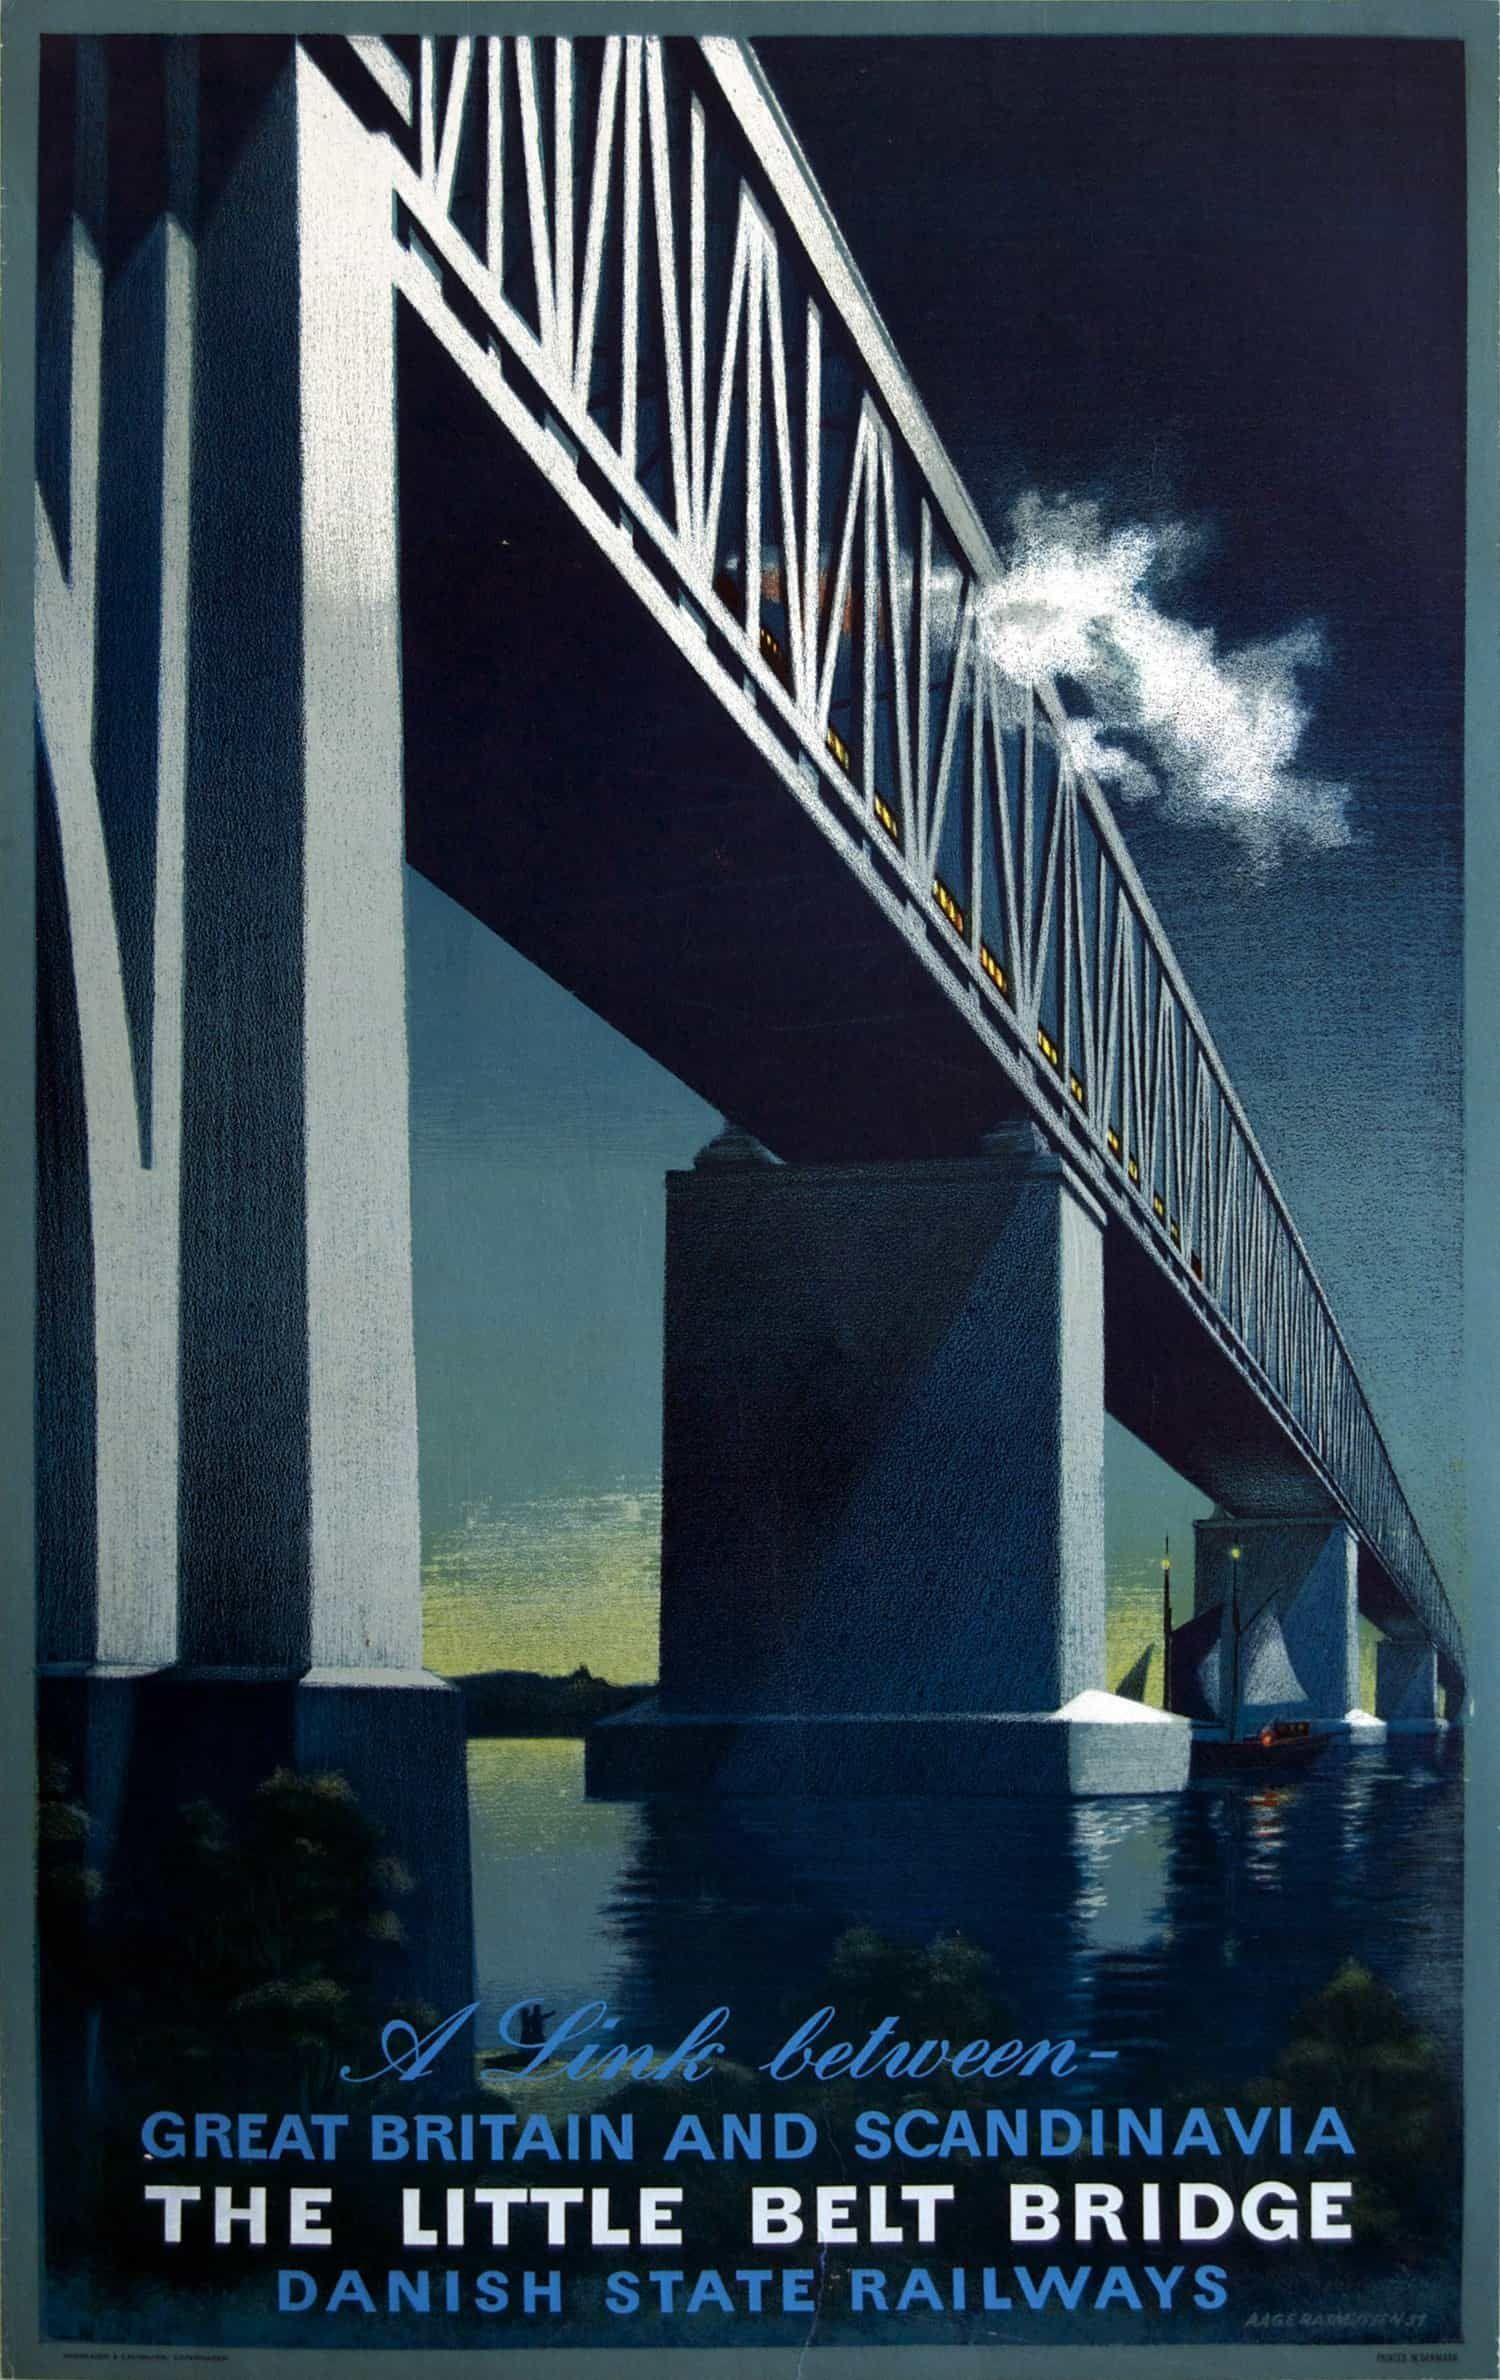 Vintage Railway Poster: The Little Belt Bridge, Danish State Railways classic, high resolution, old, retro, transportation, travel, vintage #VintageTravelPosters